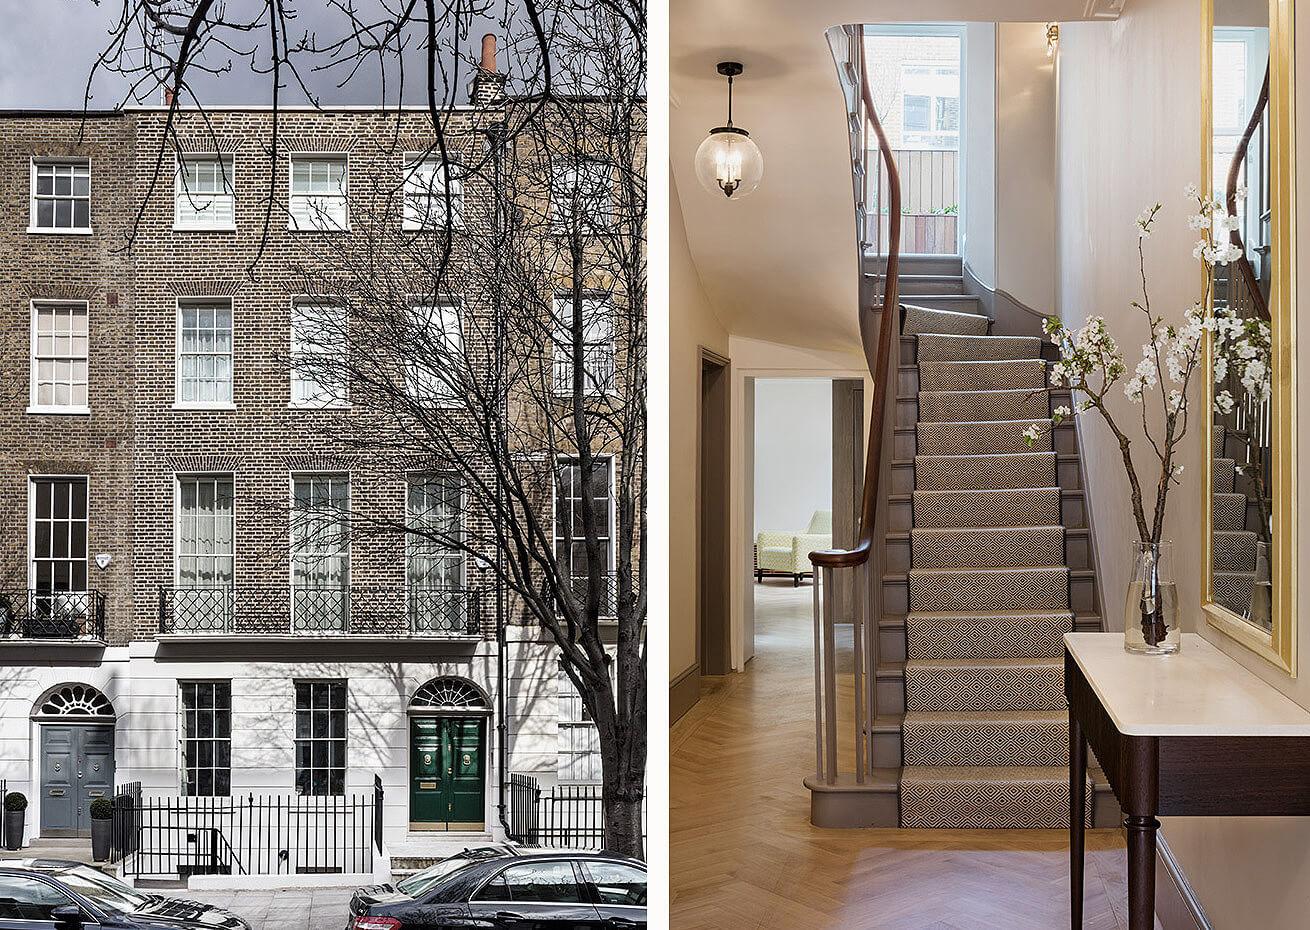 Emily_Bizley_Interior_Design_London_House_Staircase